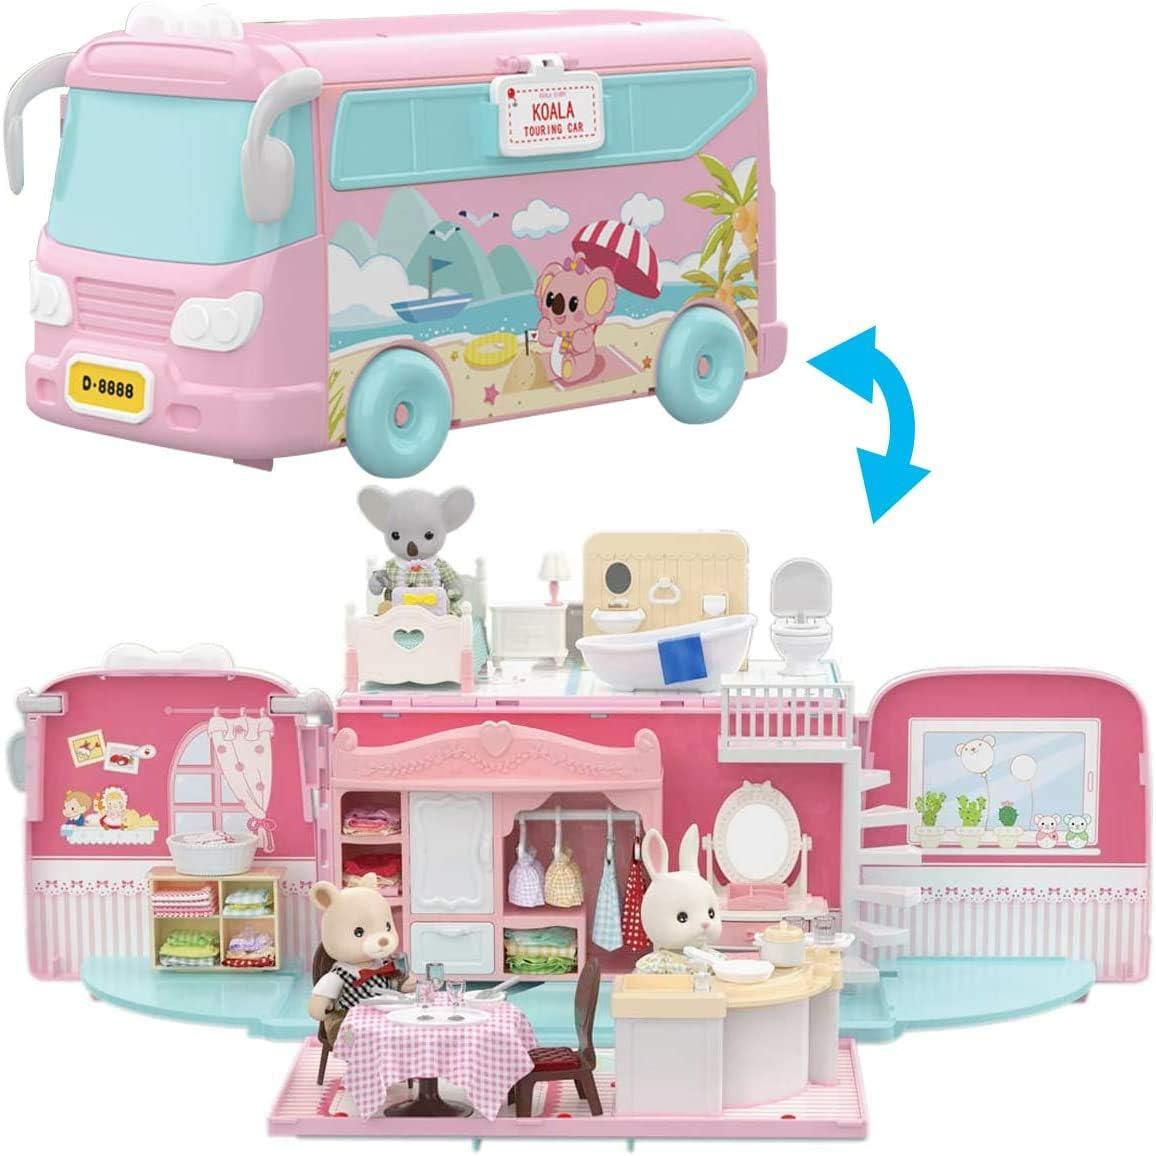 Mitcien Dollhouse Playset DIY Pretend Portable Caravan Camper discount Recommended B